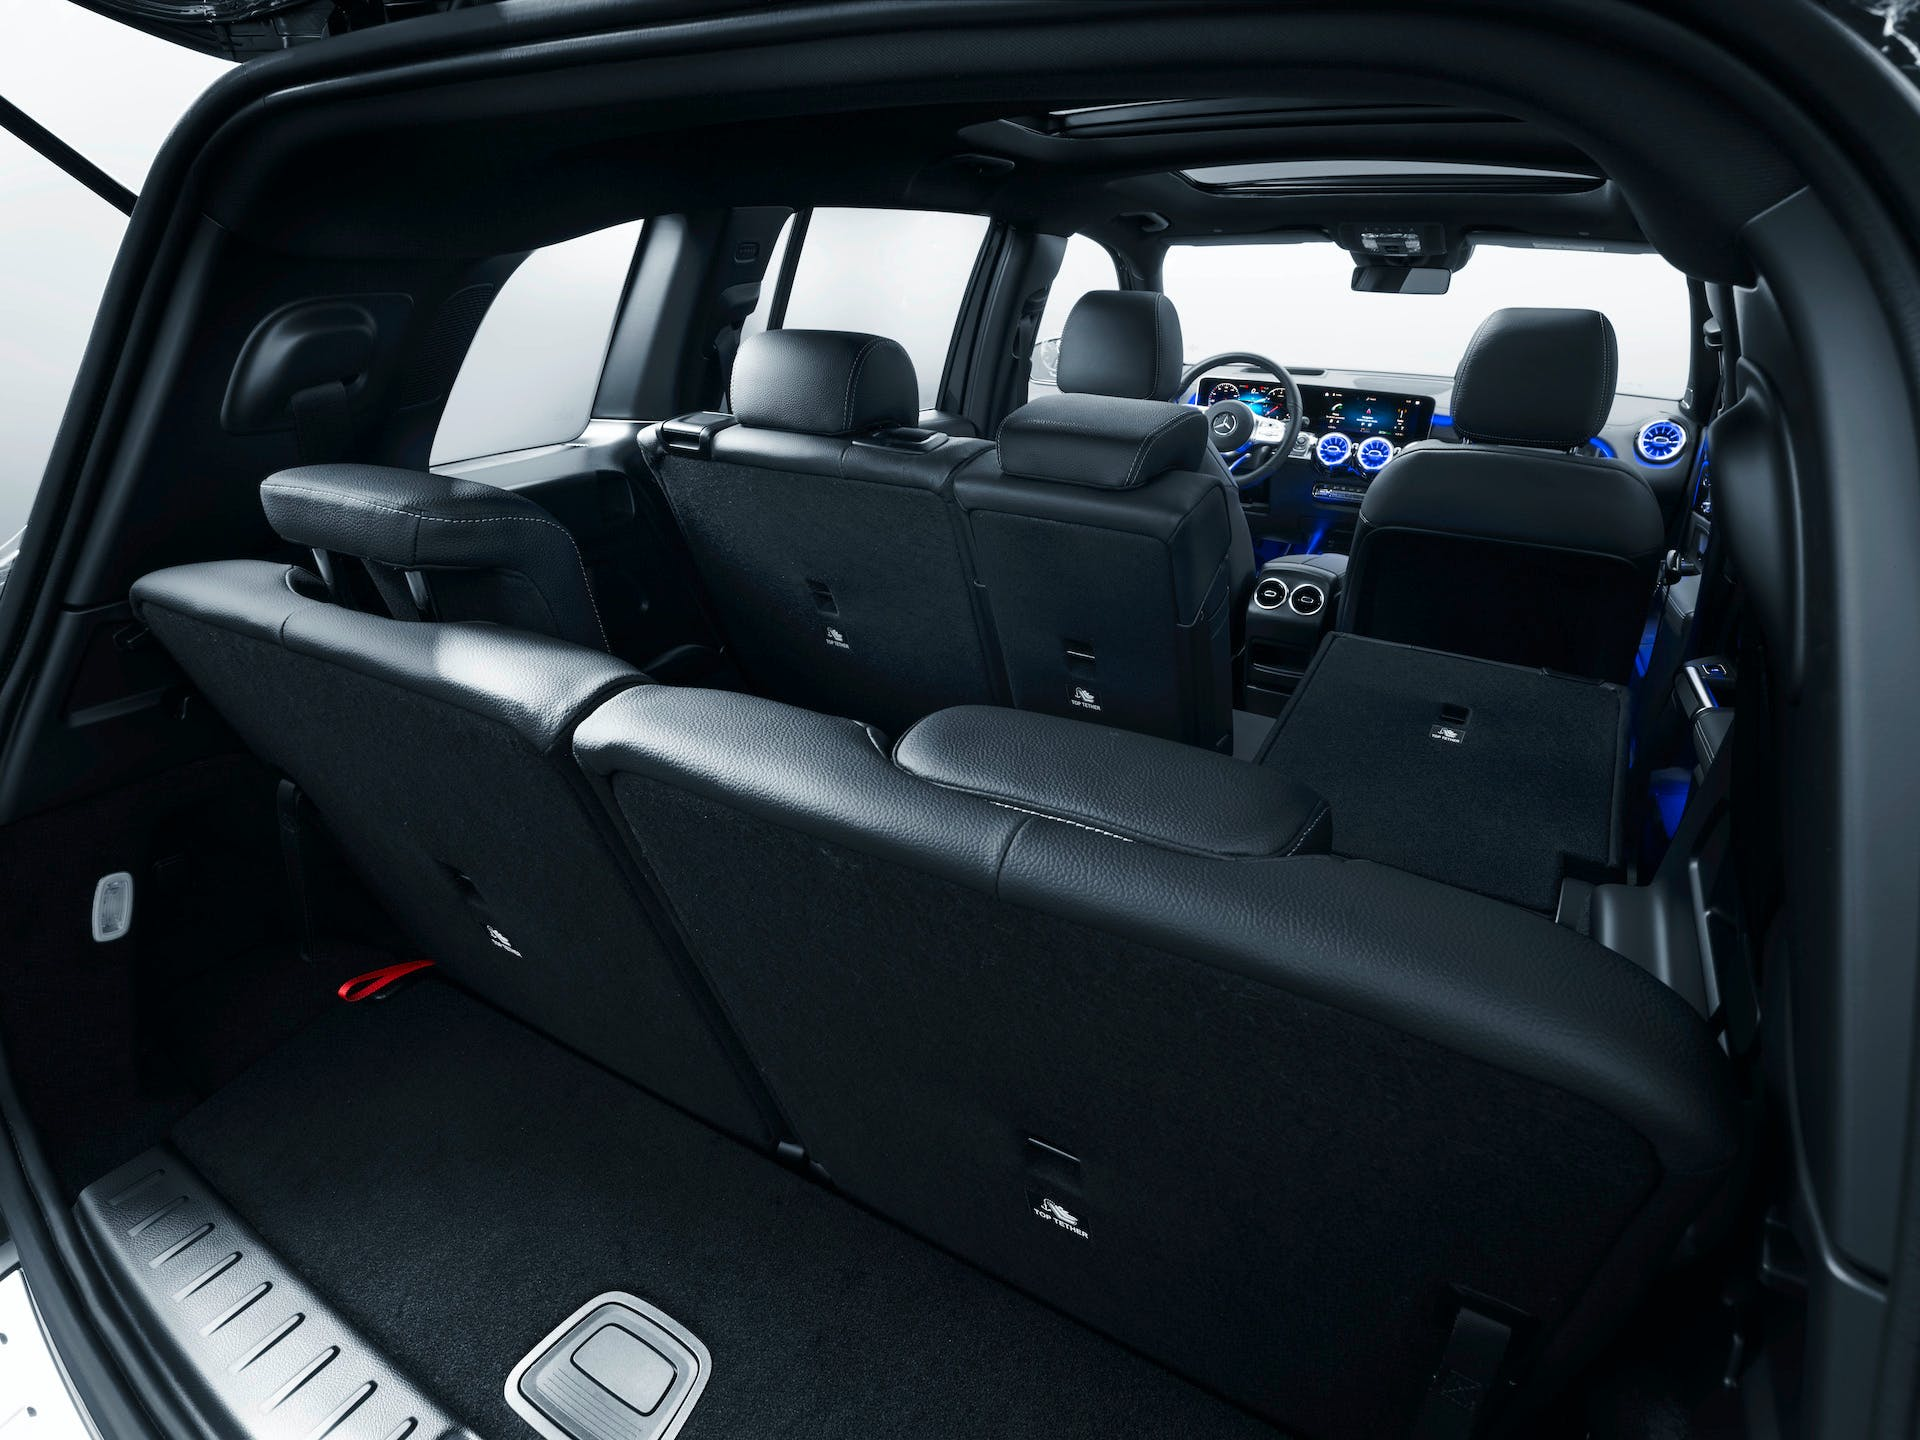 Mercedes-Benz GLB, tre file di sedili